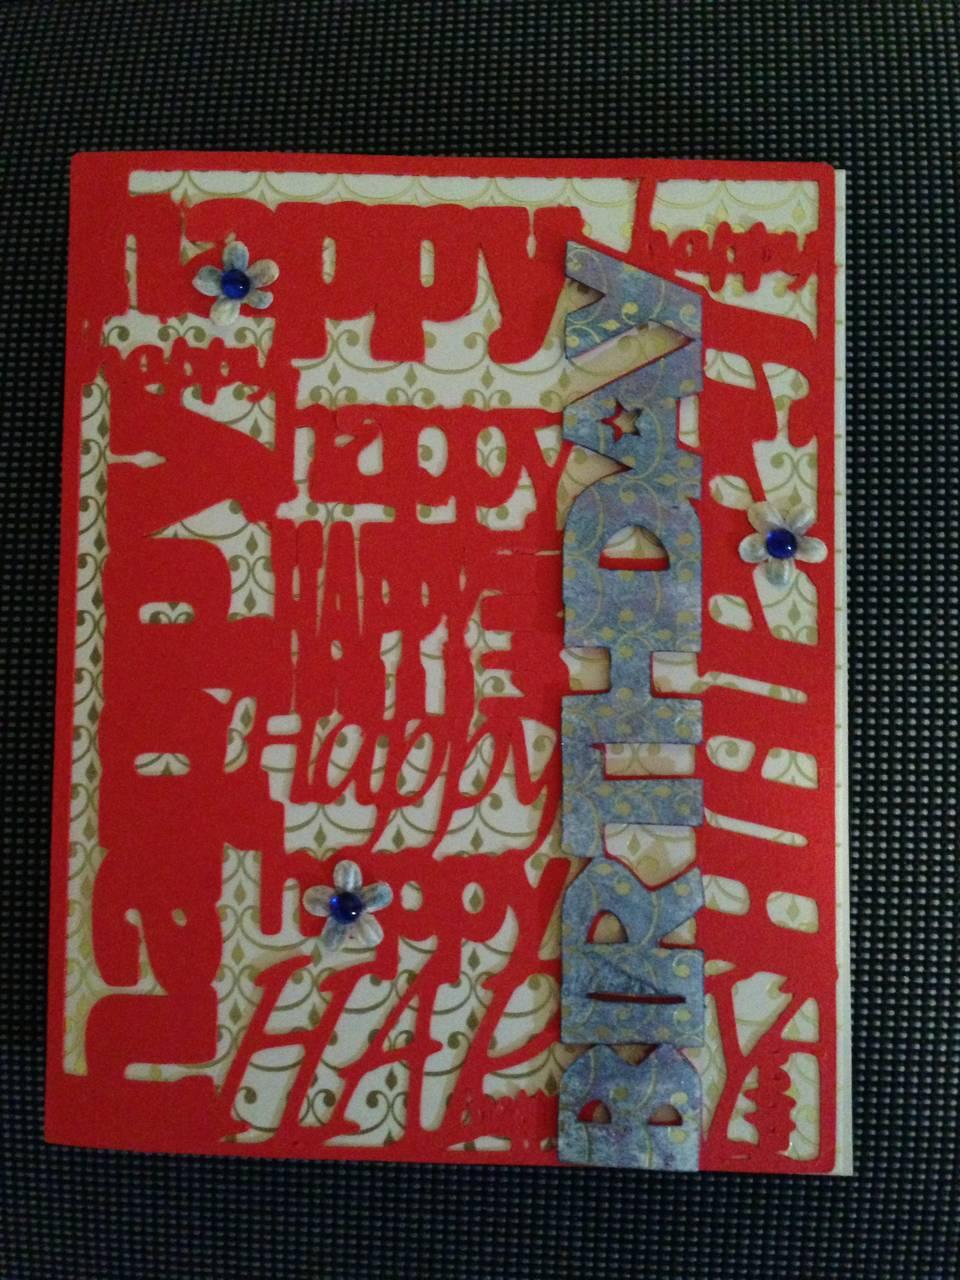 Birthday card with overlay